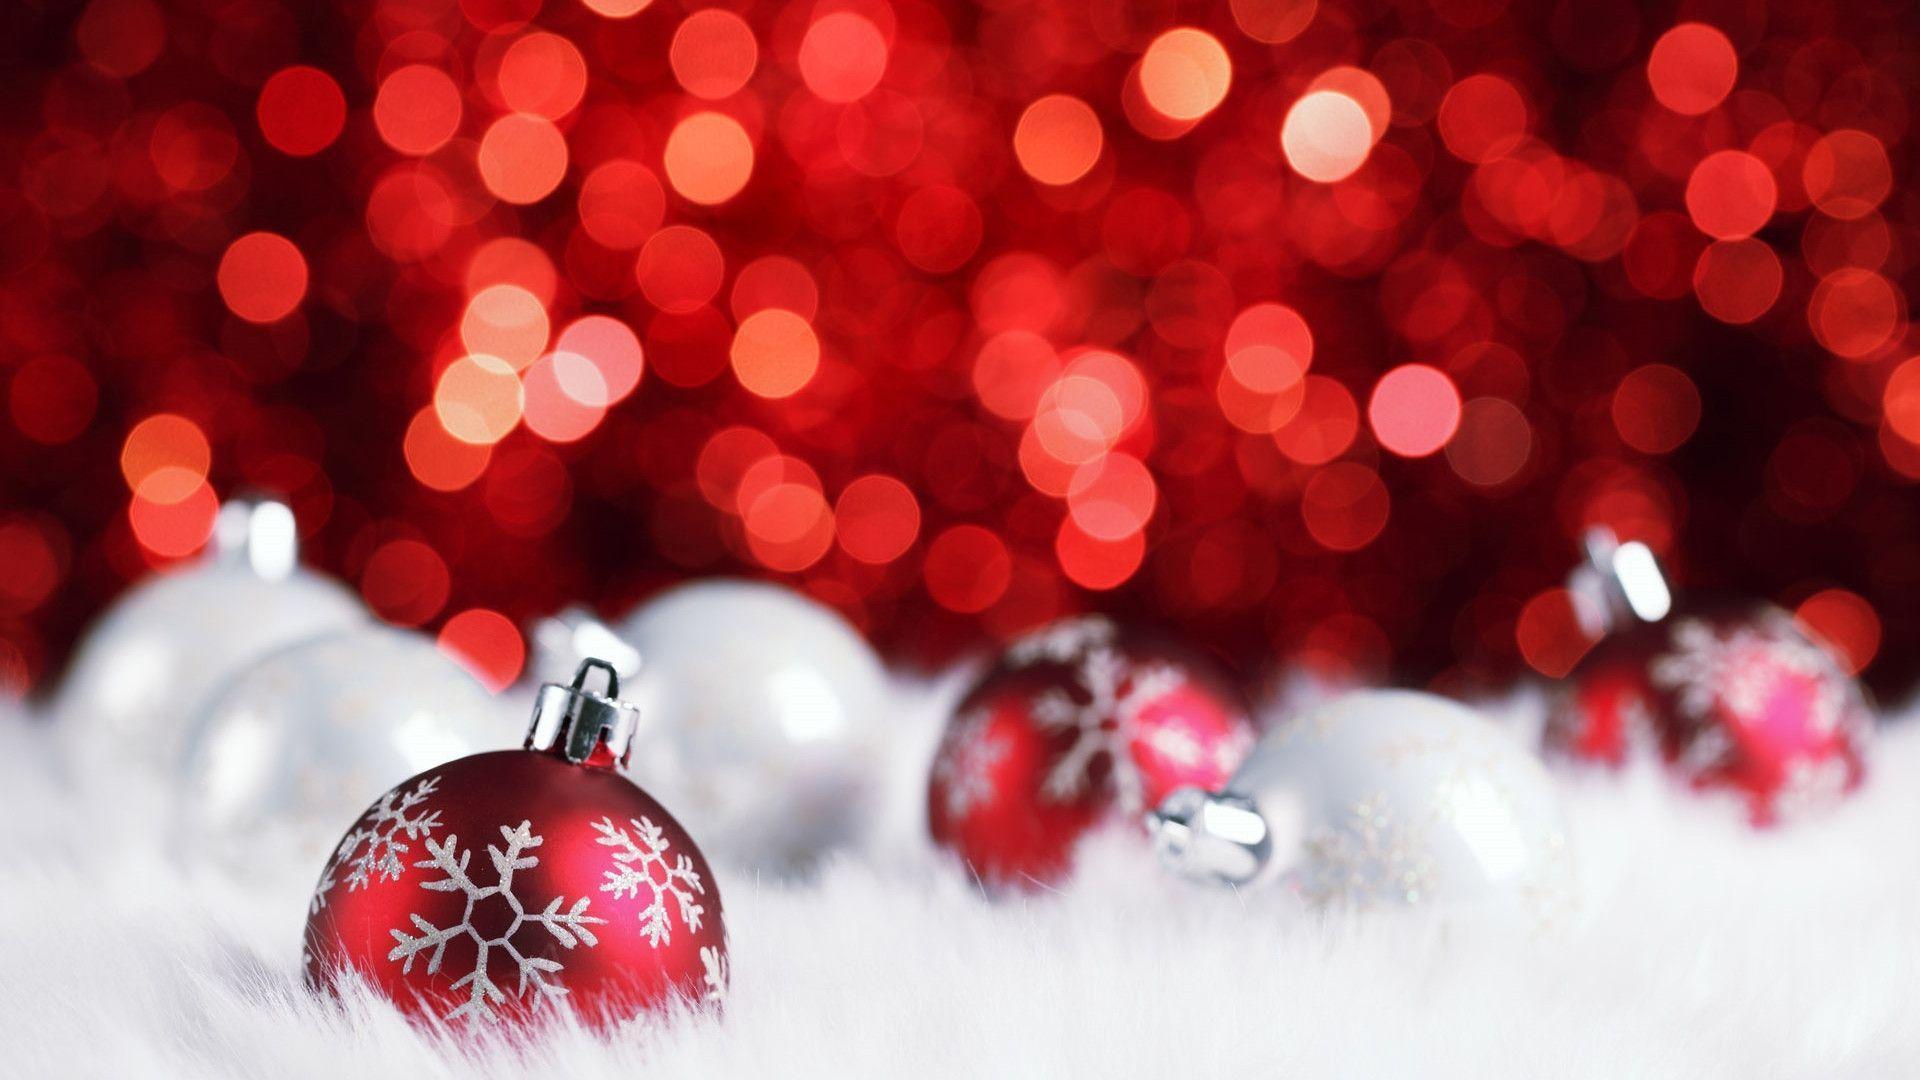 Xmas Stuff For > Christmas Ornament Wallpaper Iphone